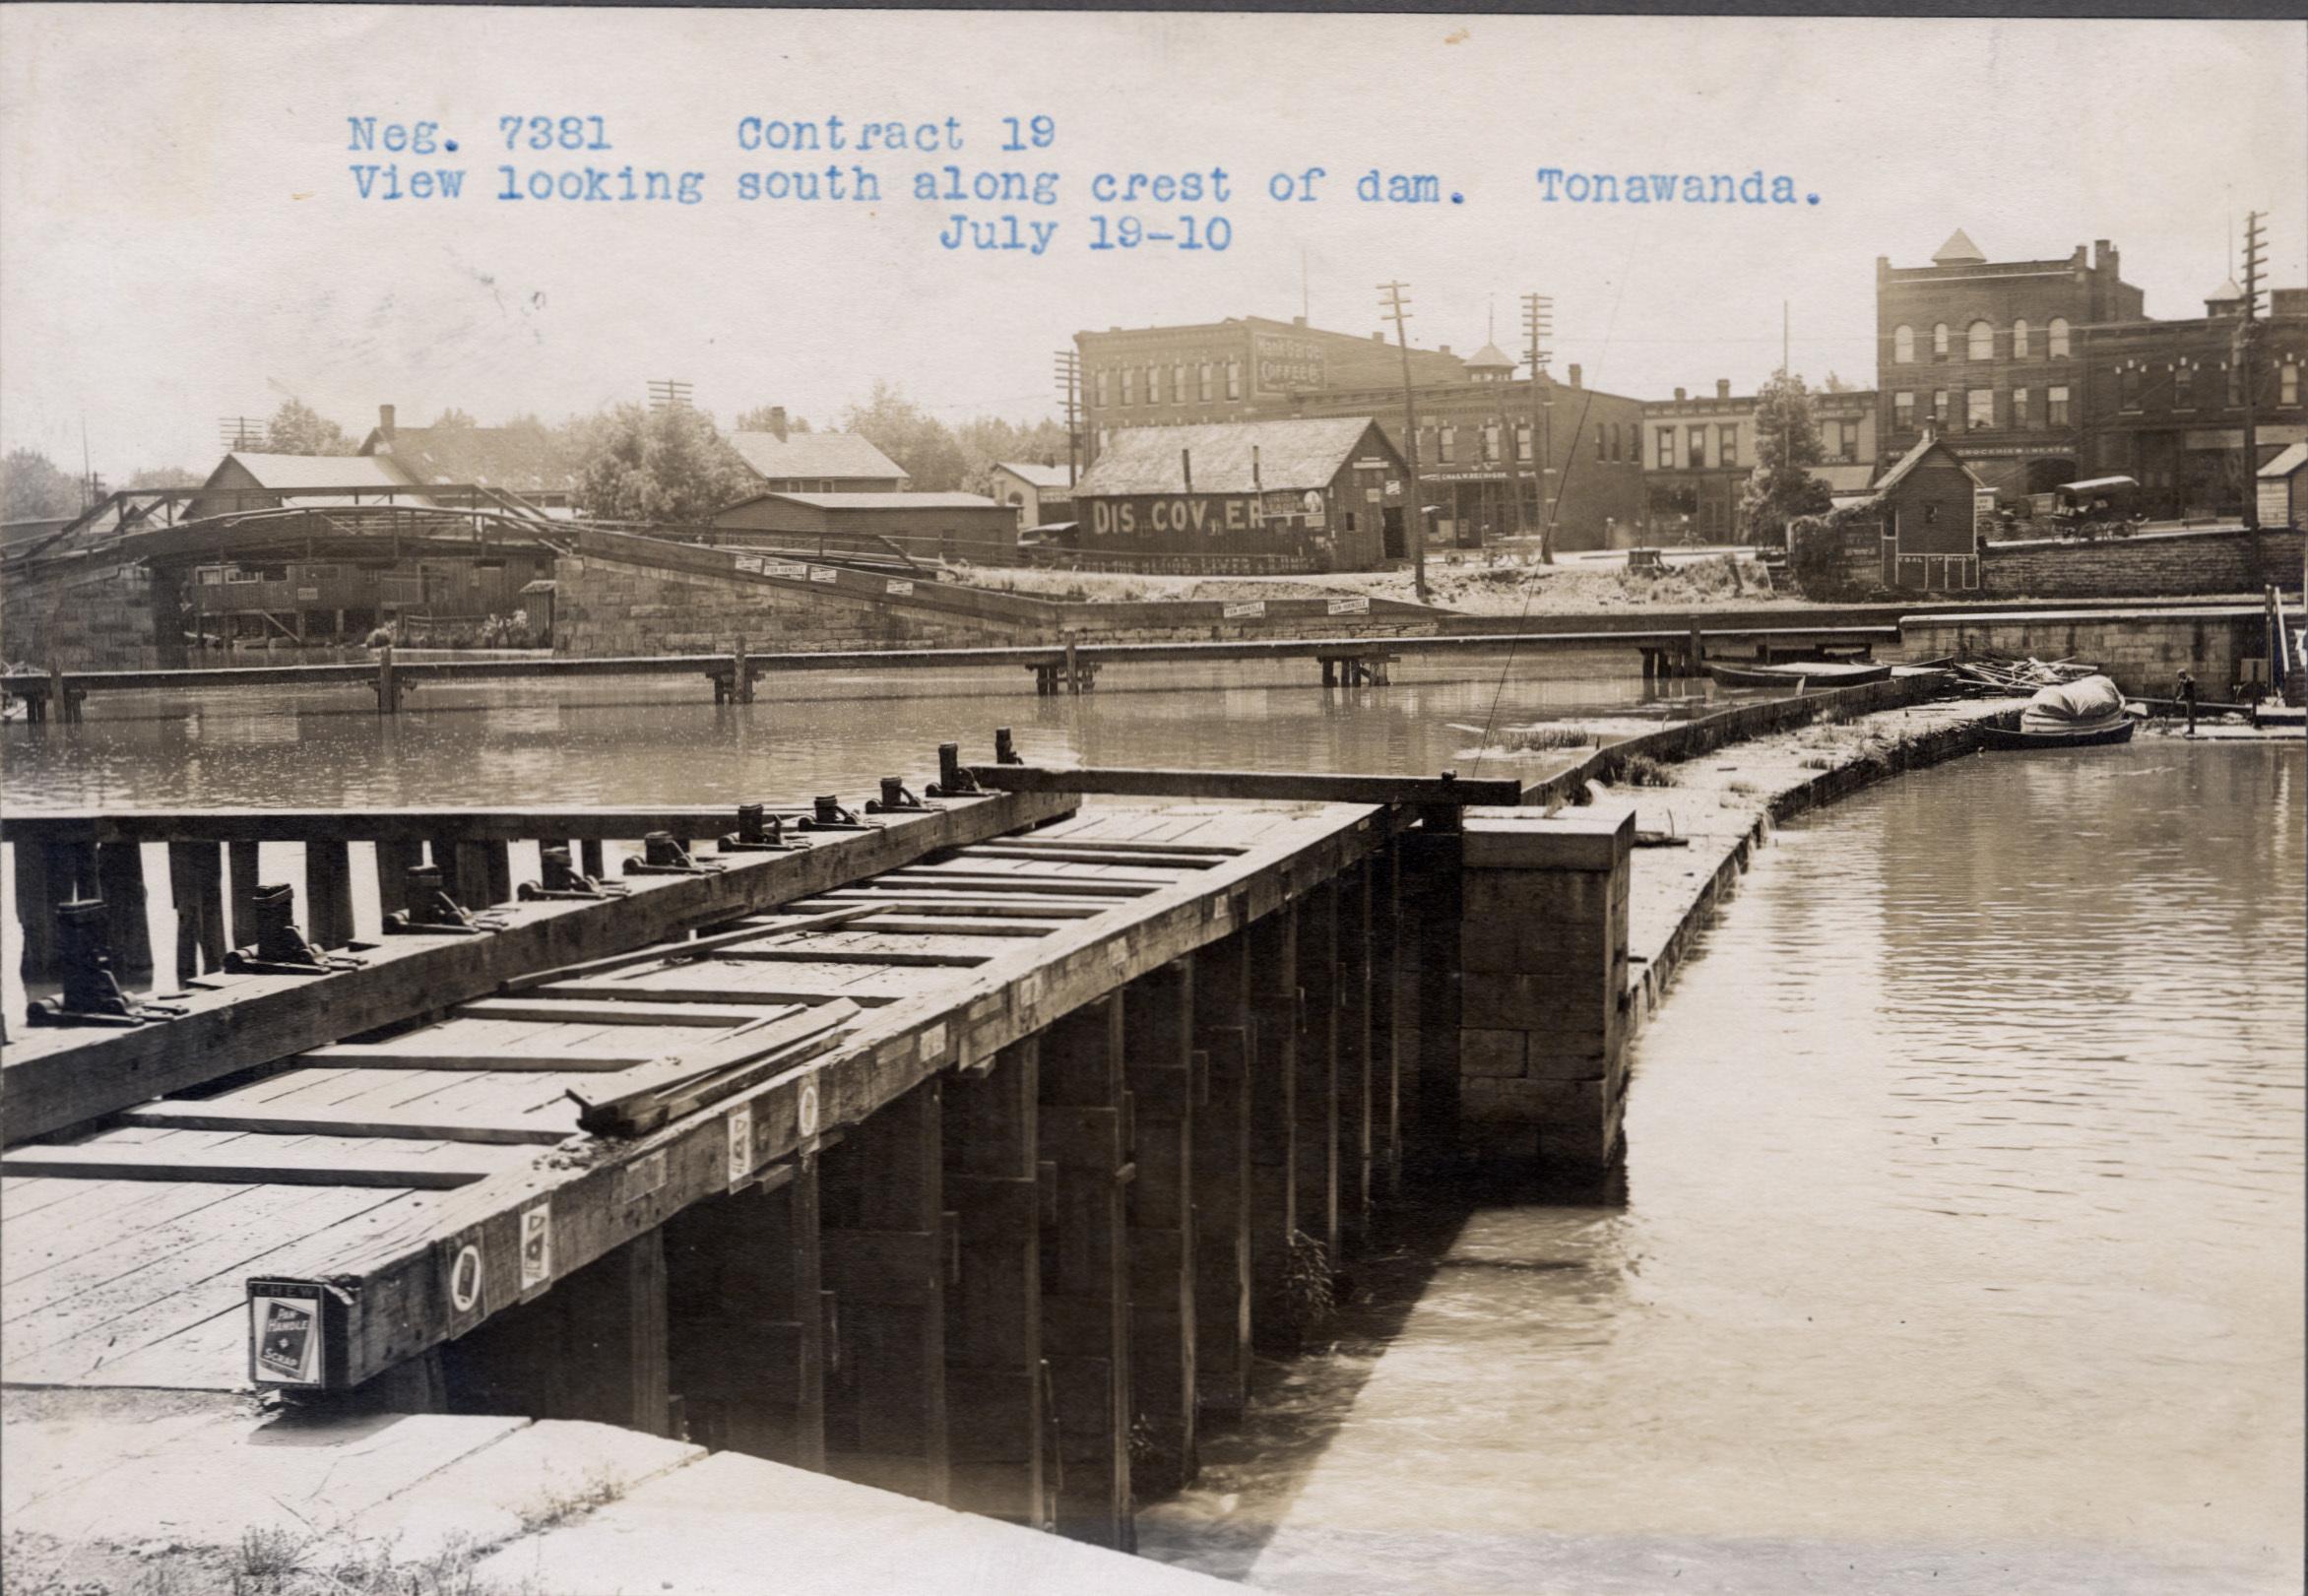 Looking south along the crest of the dam in Tonawanda, photo (NYSA, 1910-07-19).jpg